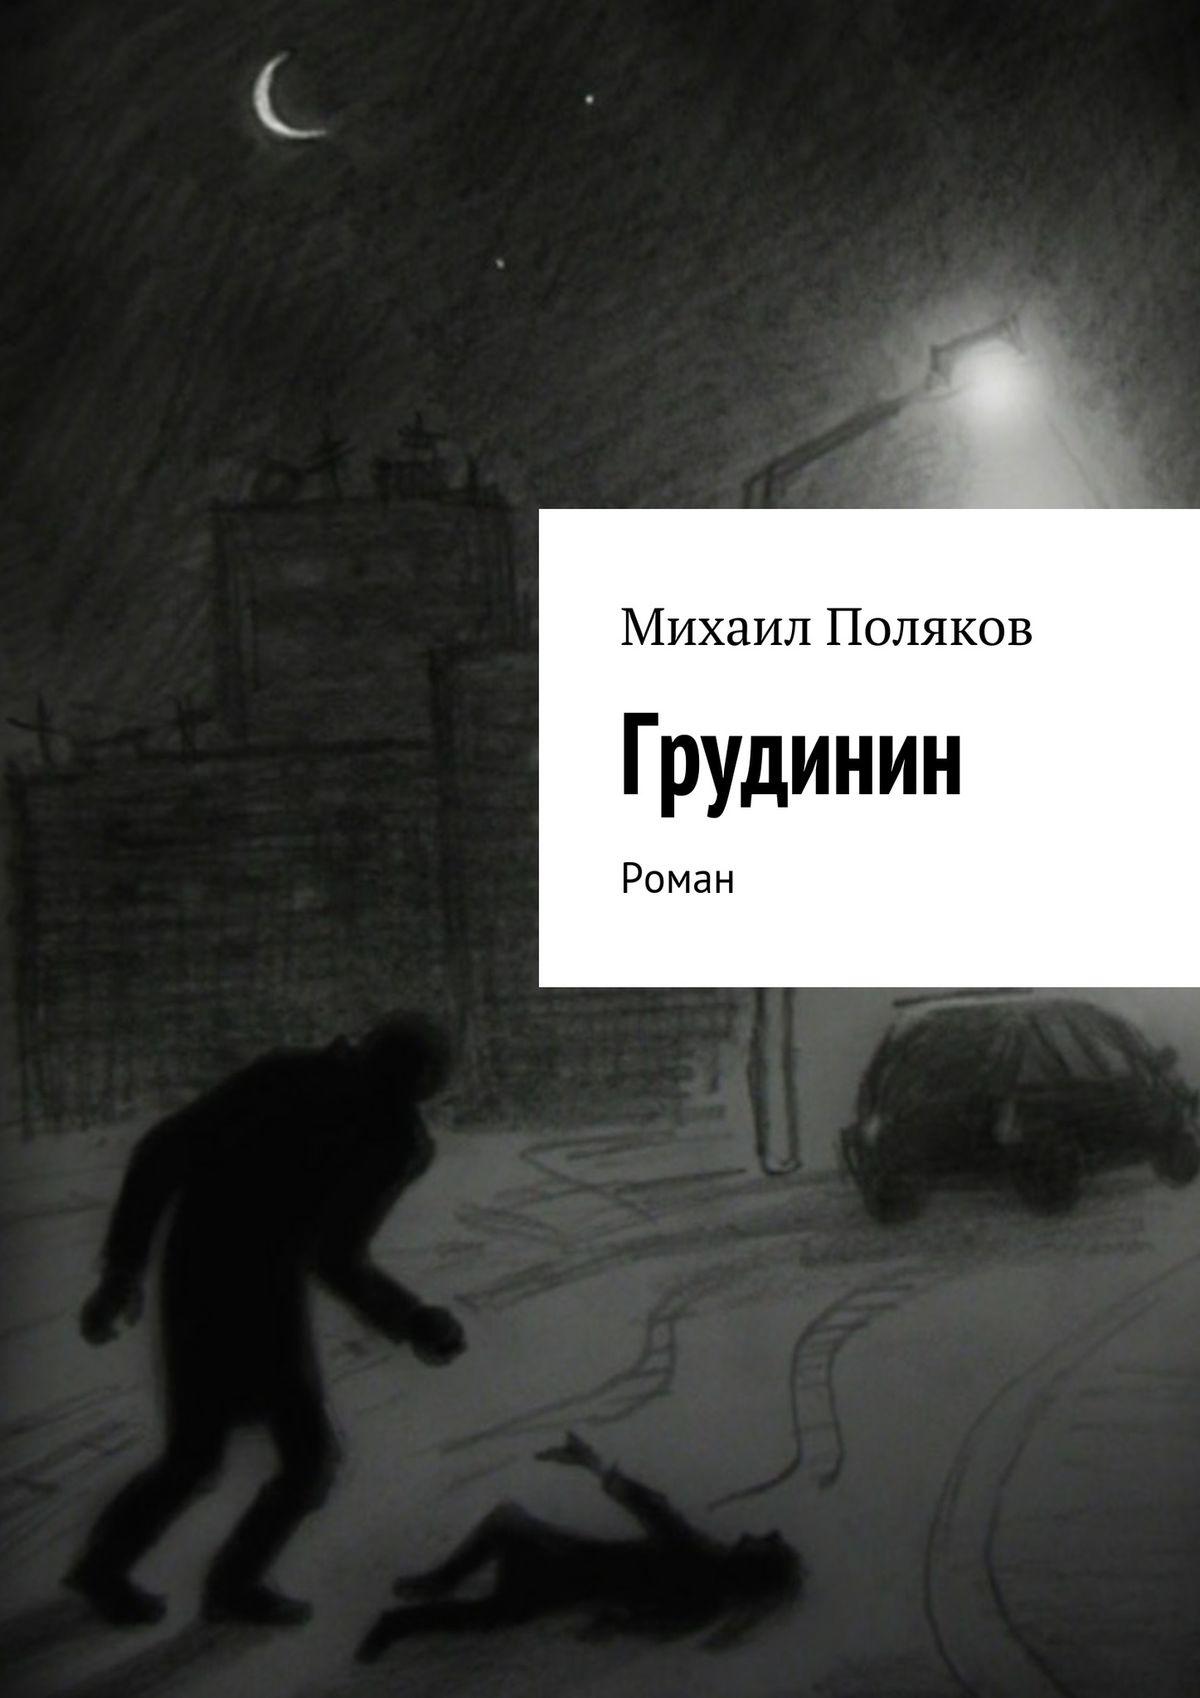 Михаил Борисович Поляков Грудинин